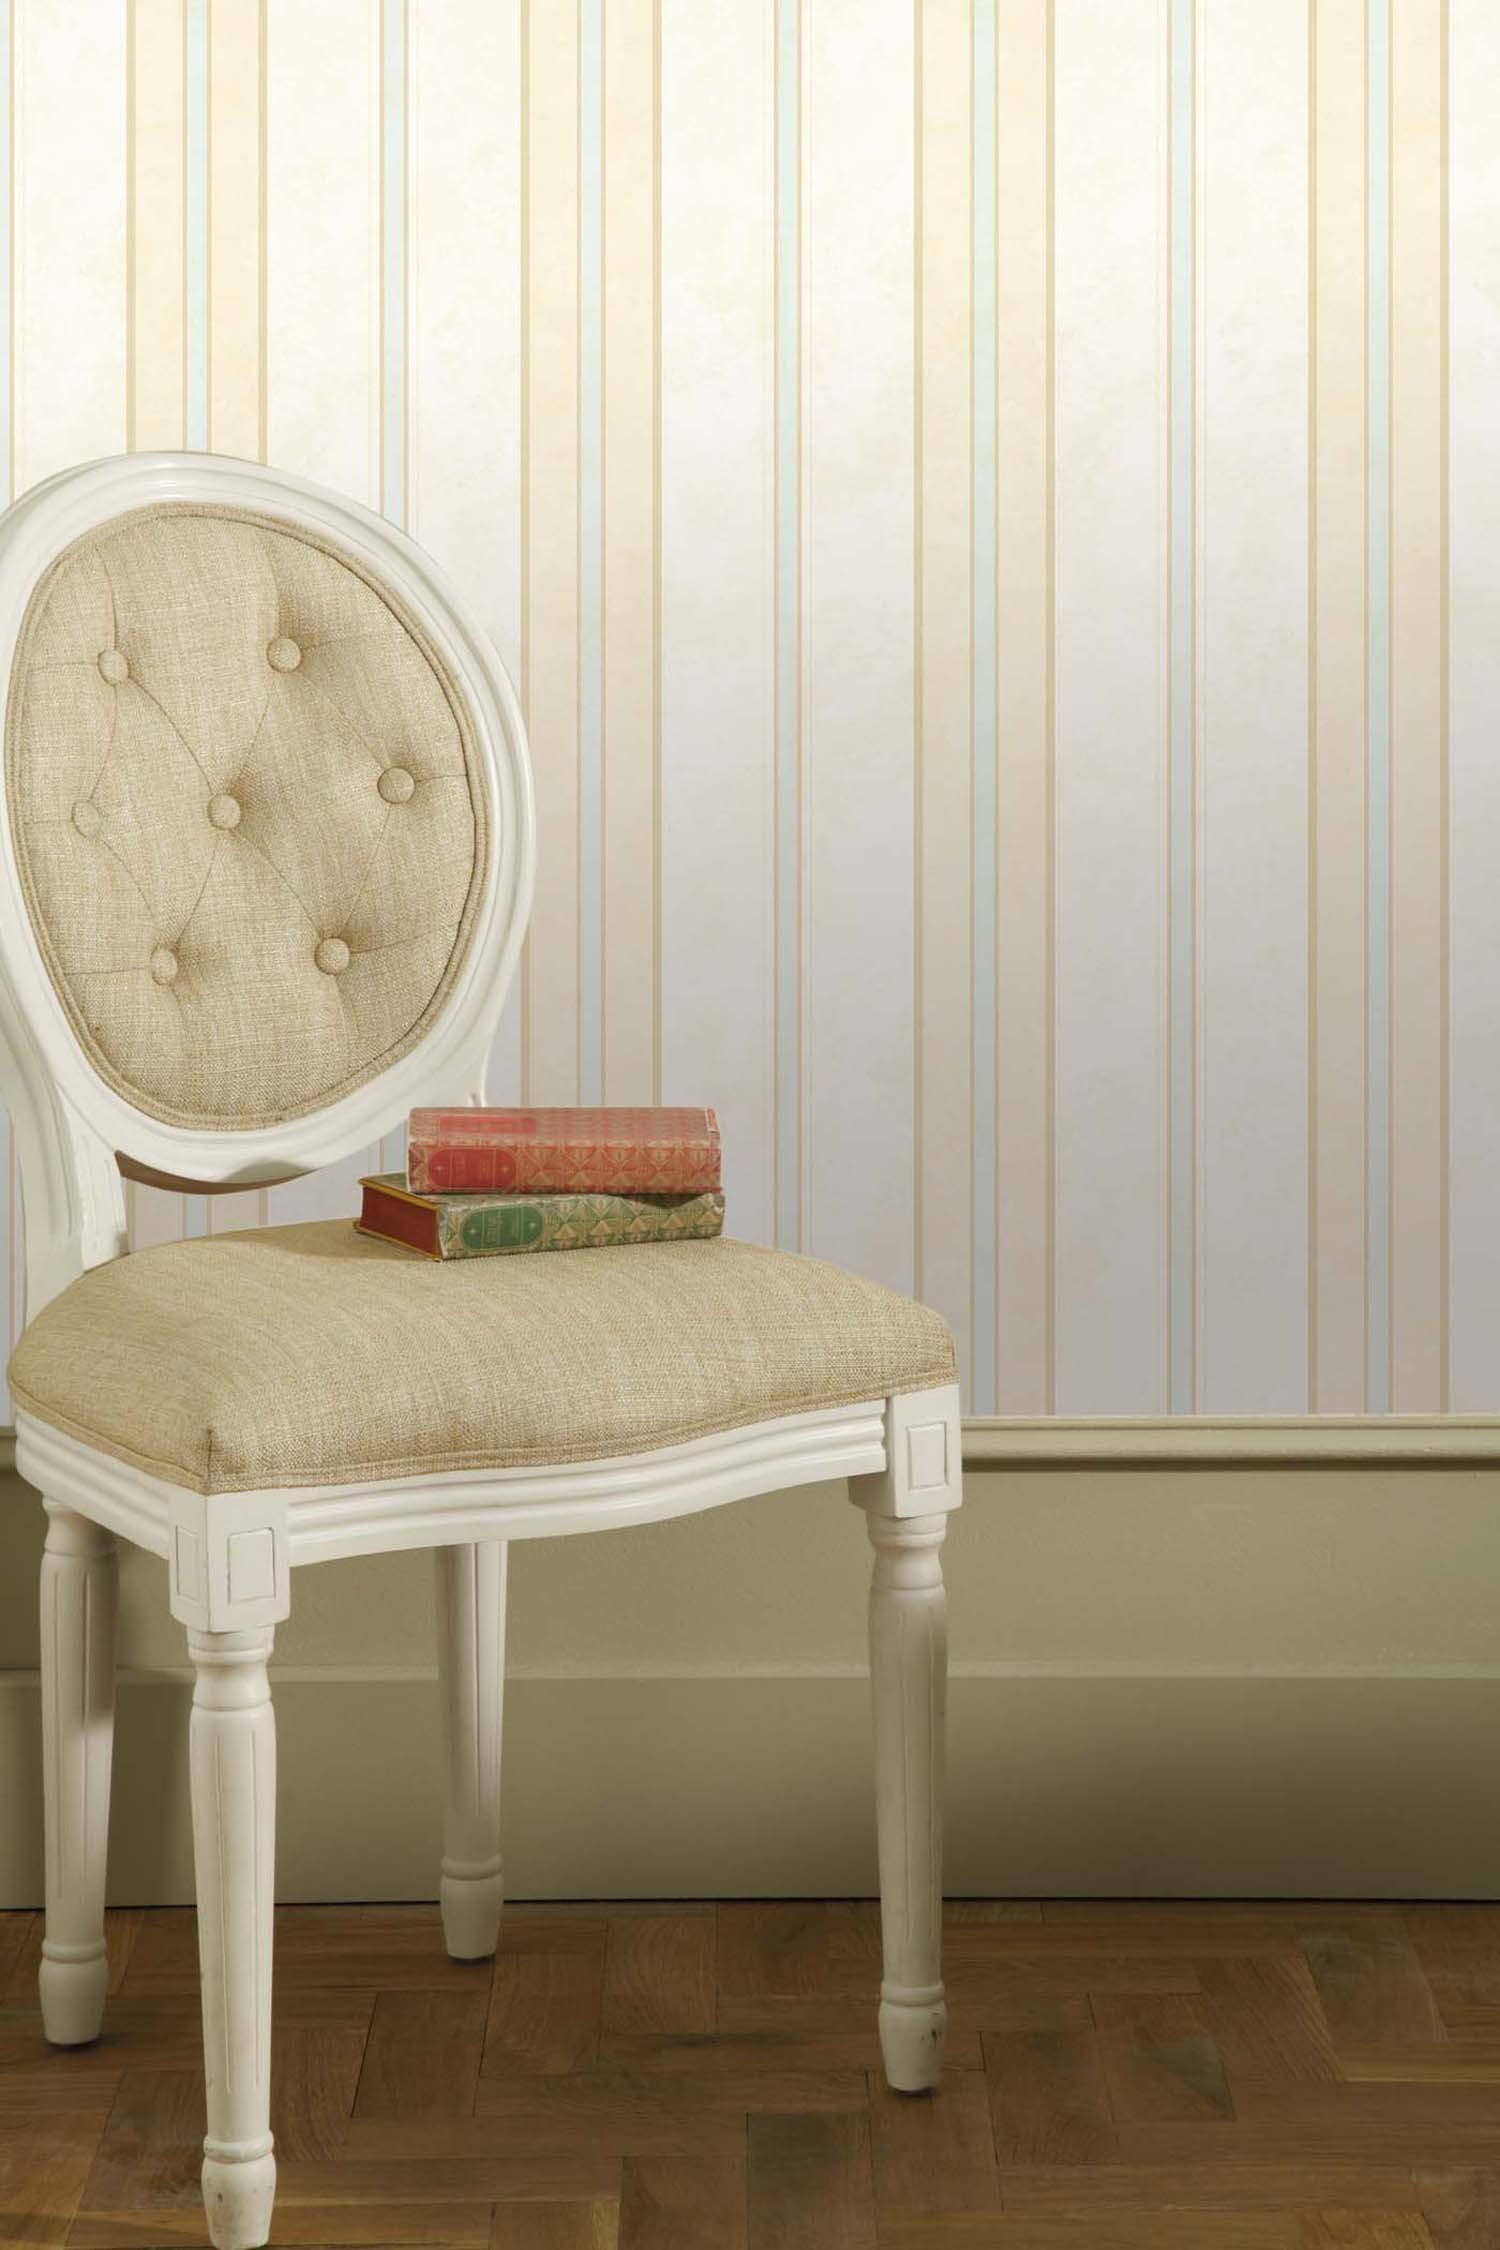 rosery tapeten rasch textil rechnungskauf gratisversand. Black Bedroom Furniture Sets. Home Design Ideas